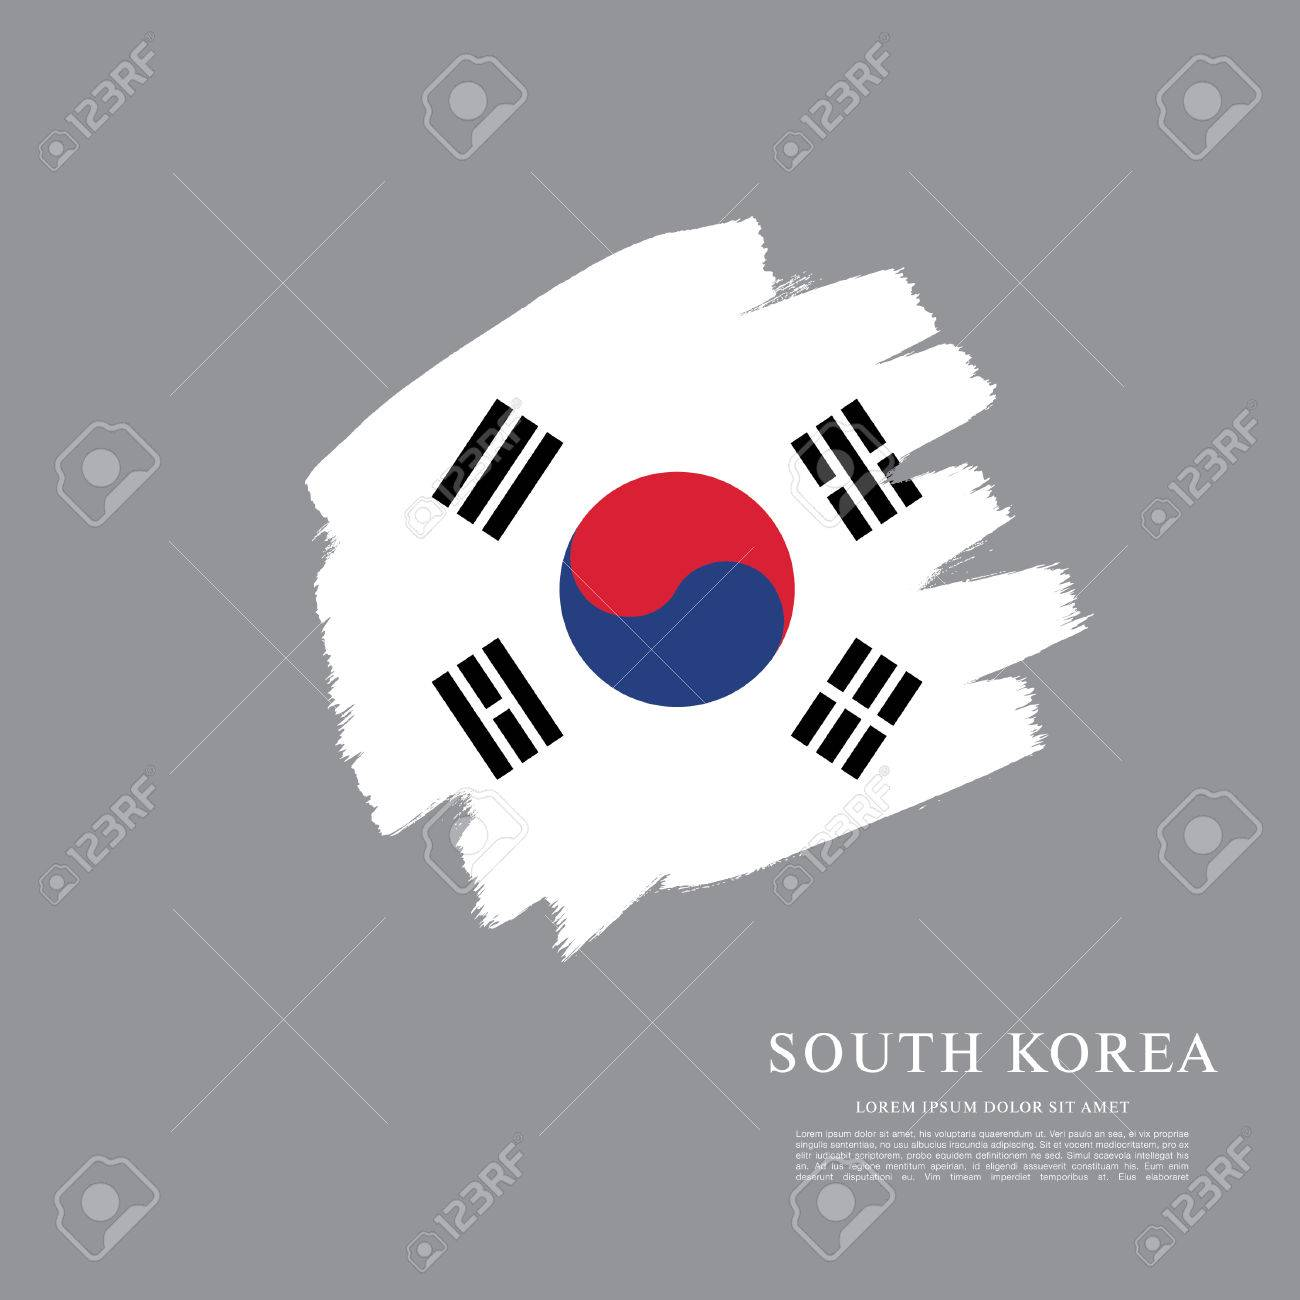 south korean flag made in brush stroke background royalty free